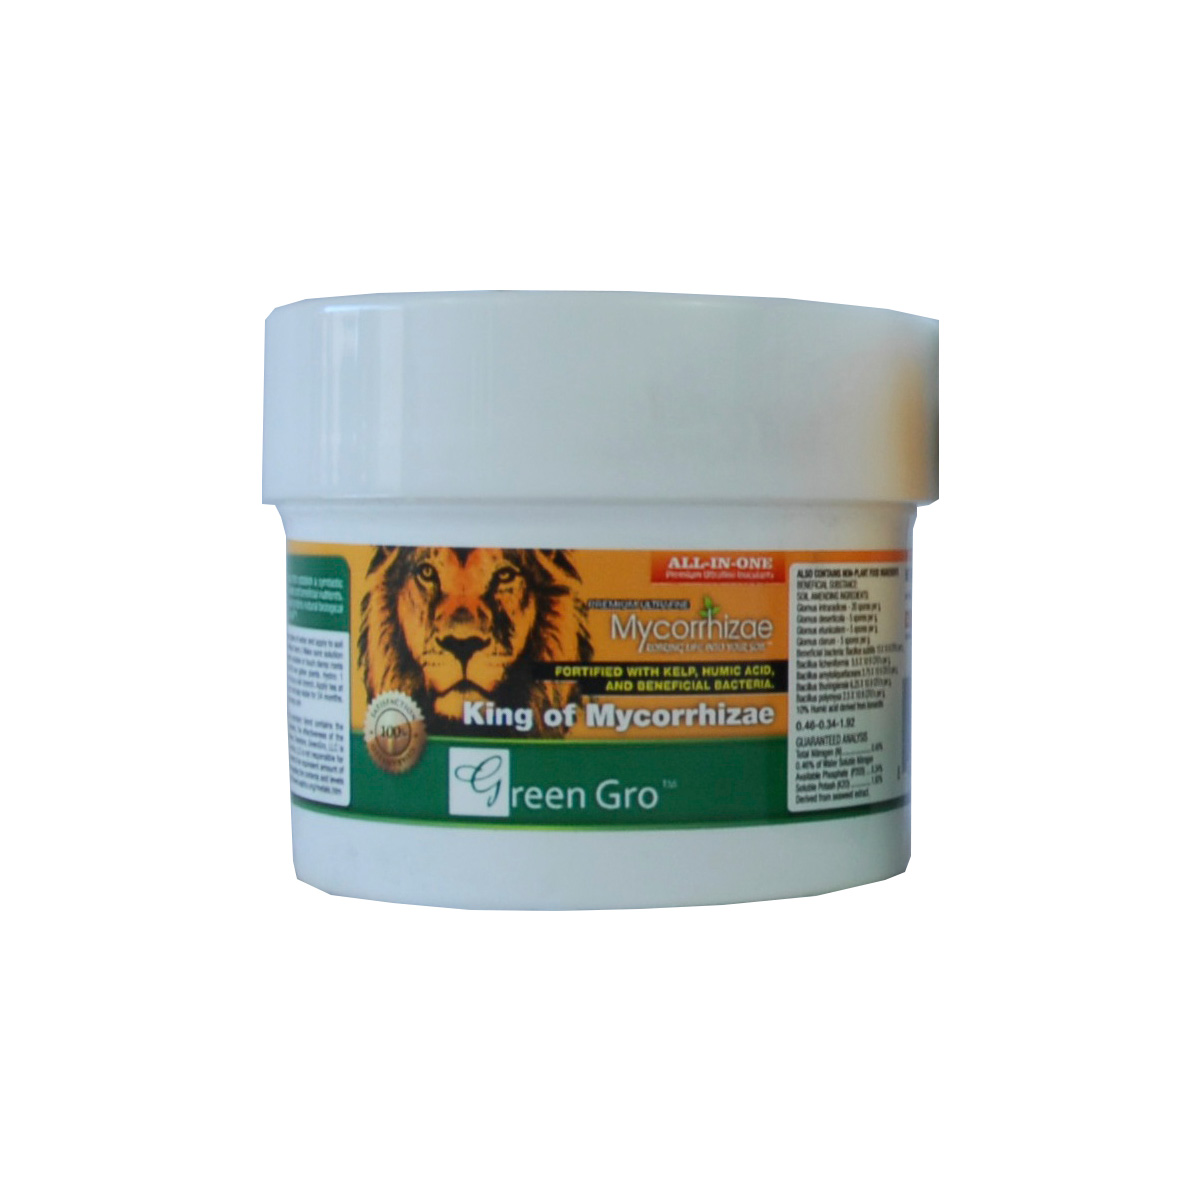 Greengro Ultrafine Myco 4oz AIO